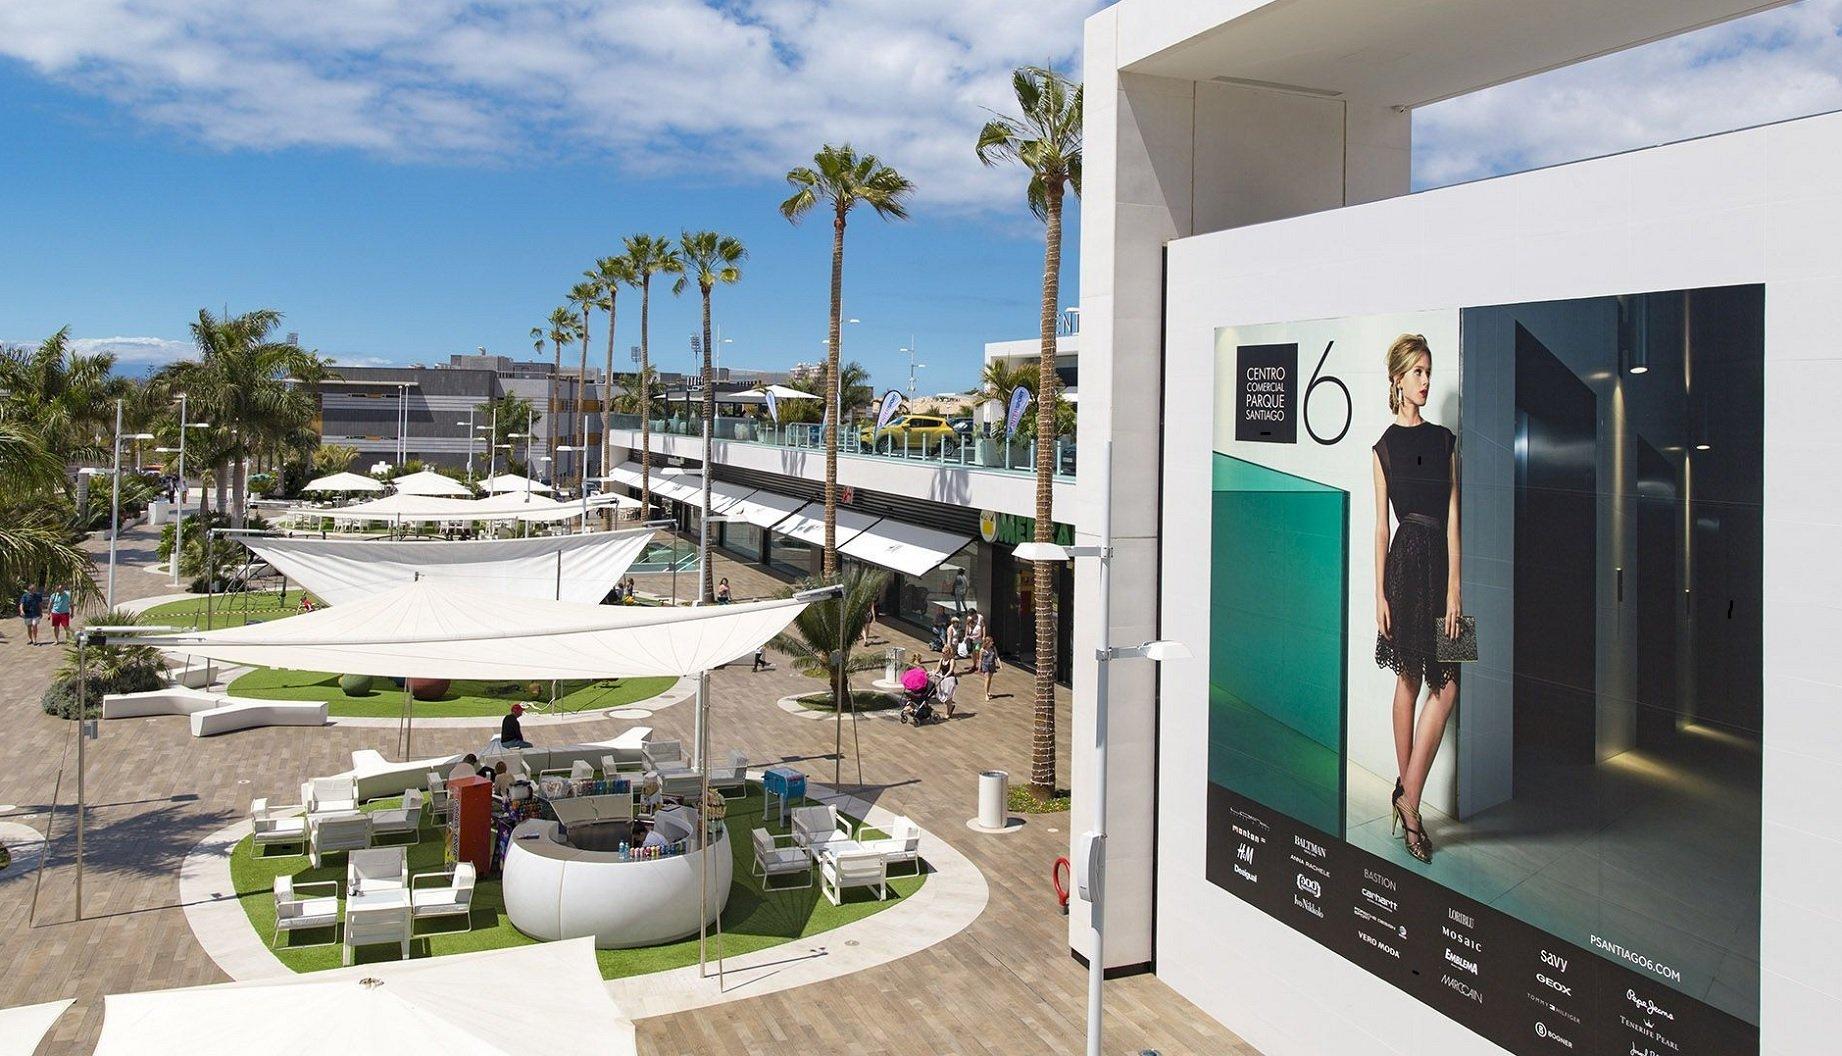 Parque Santiago 6 Shopping Centre Tenerife